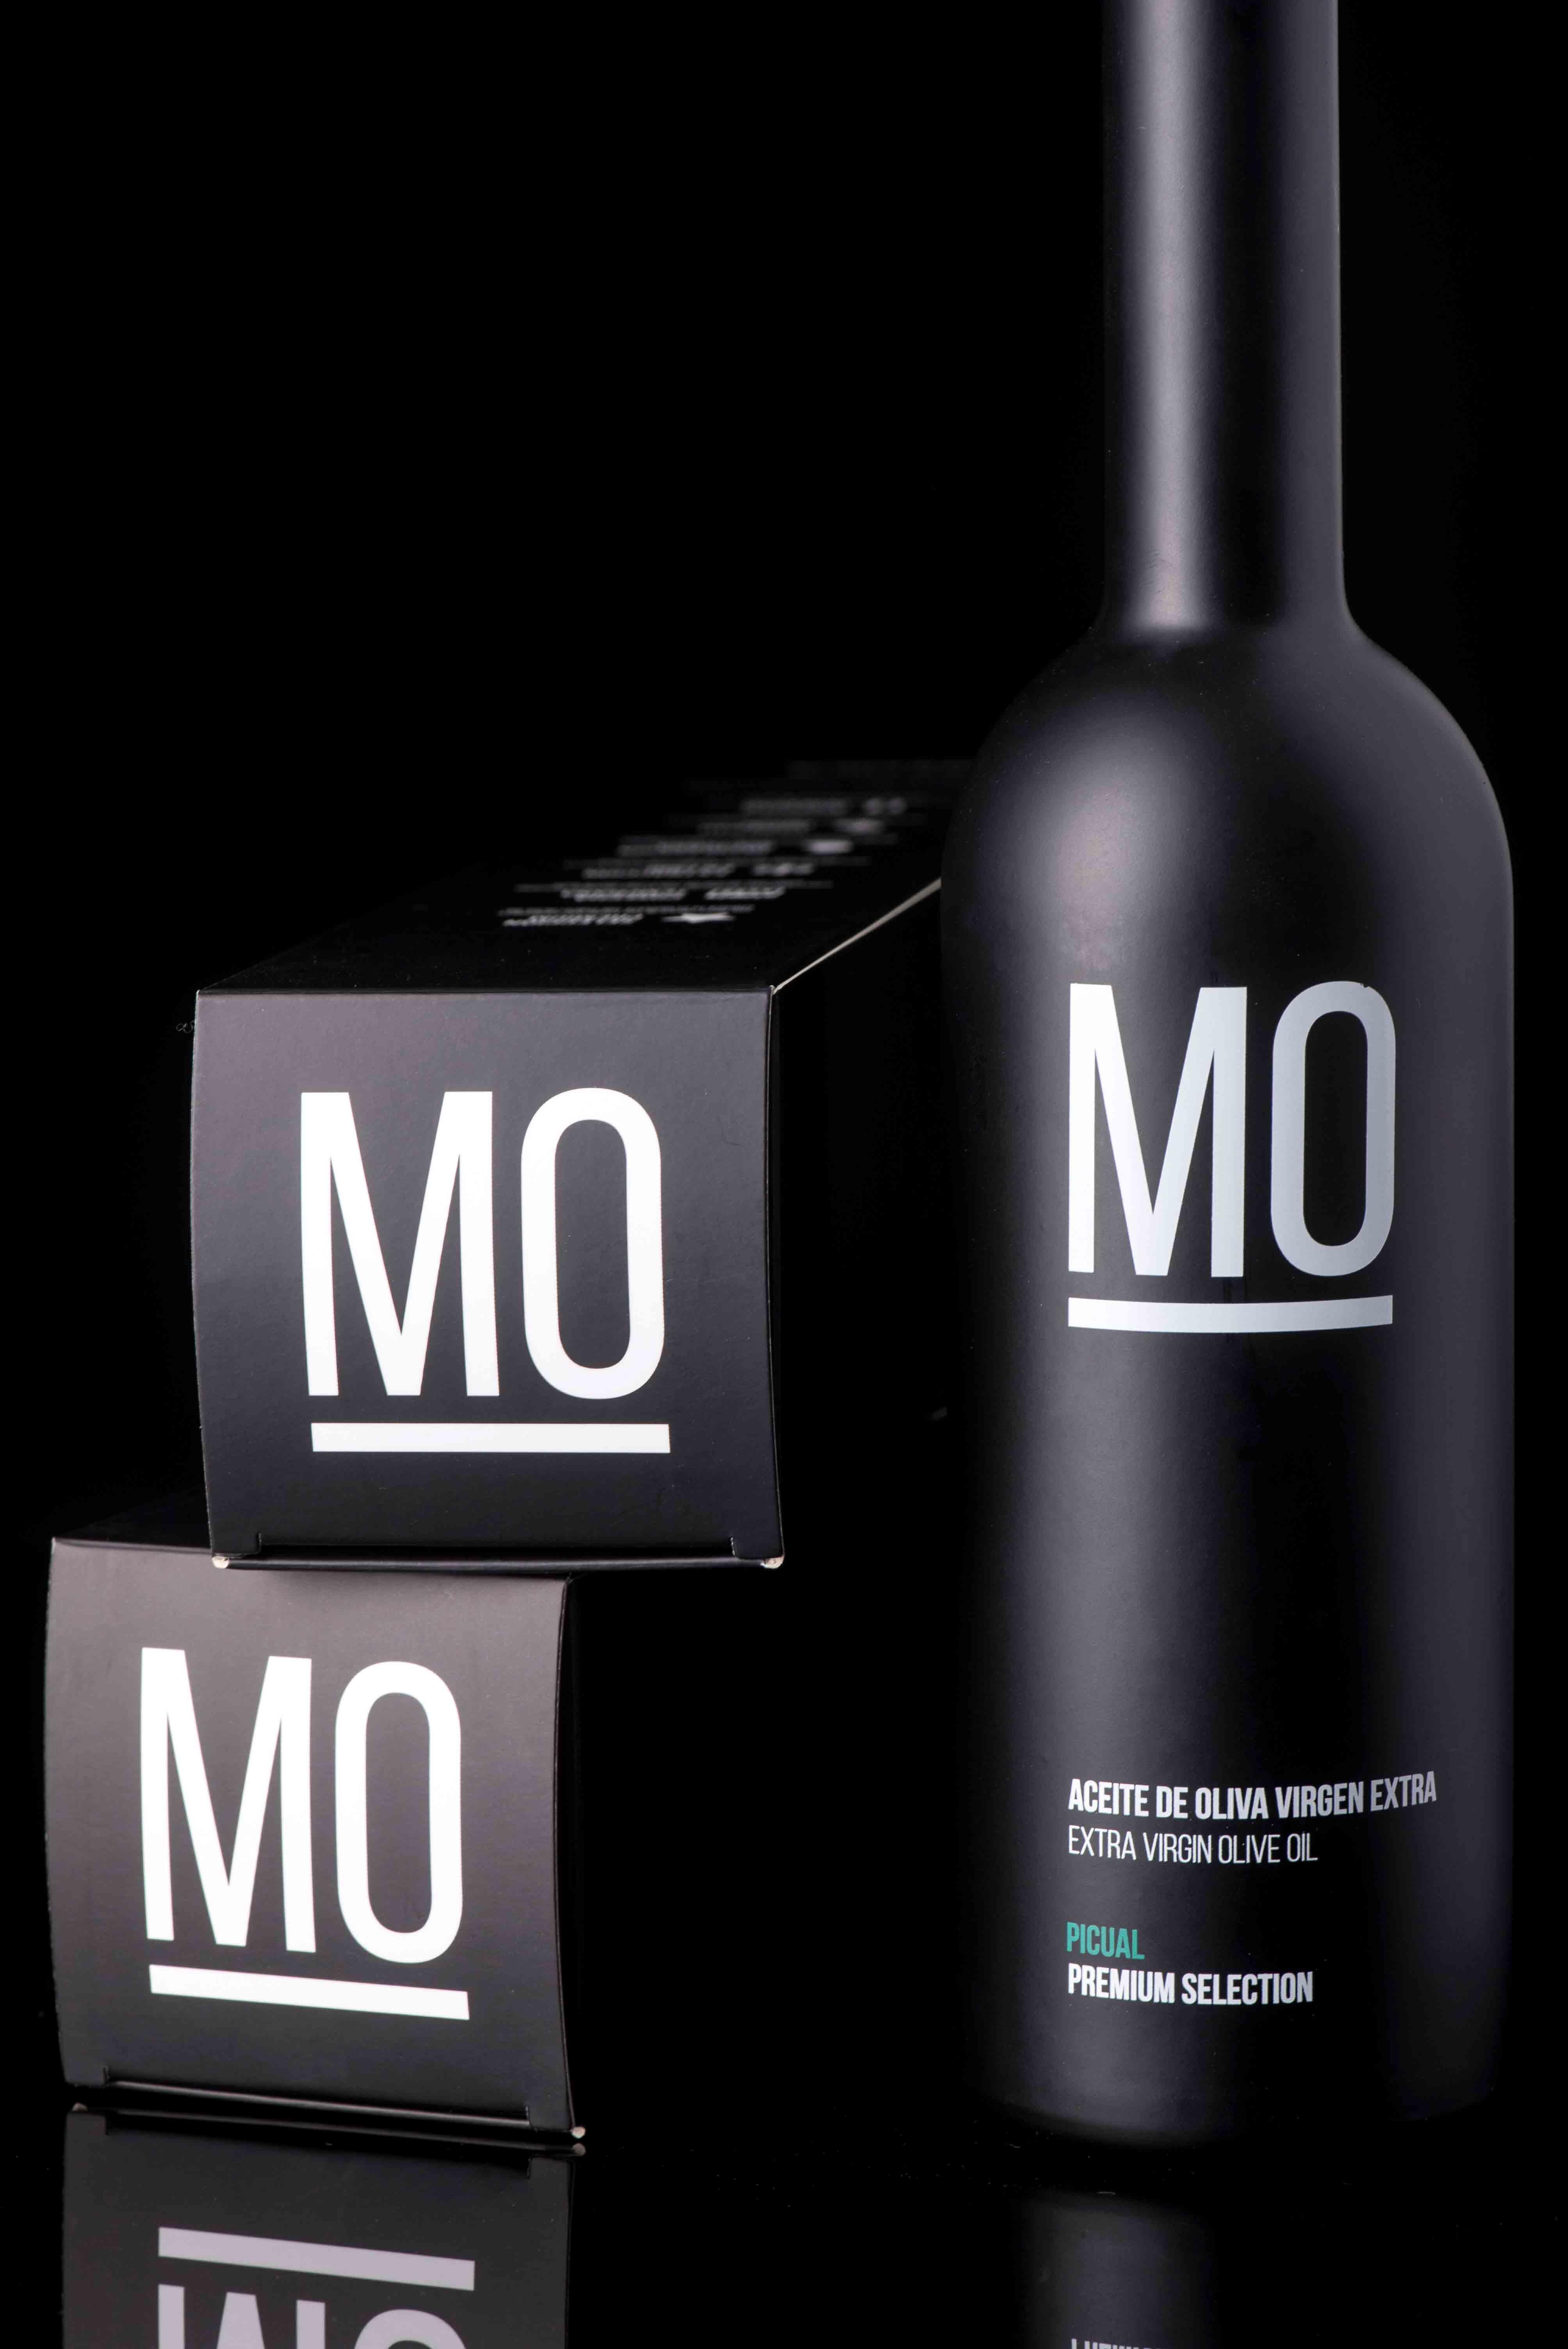 Compra MO Premium en Origen Oliva